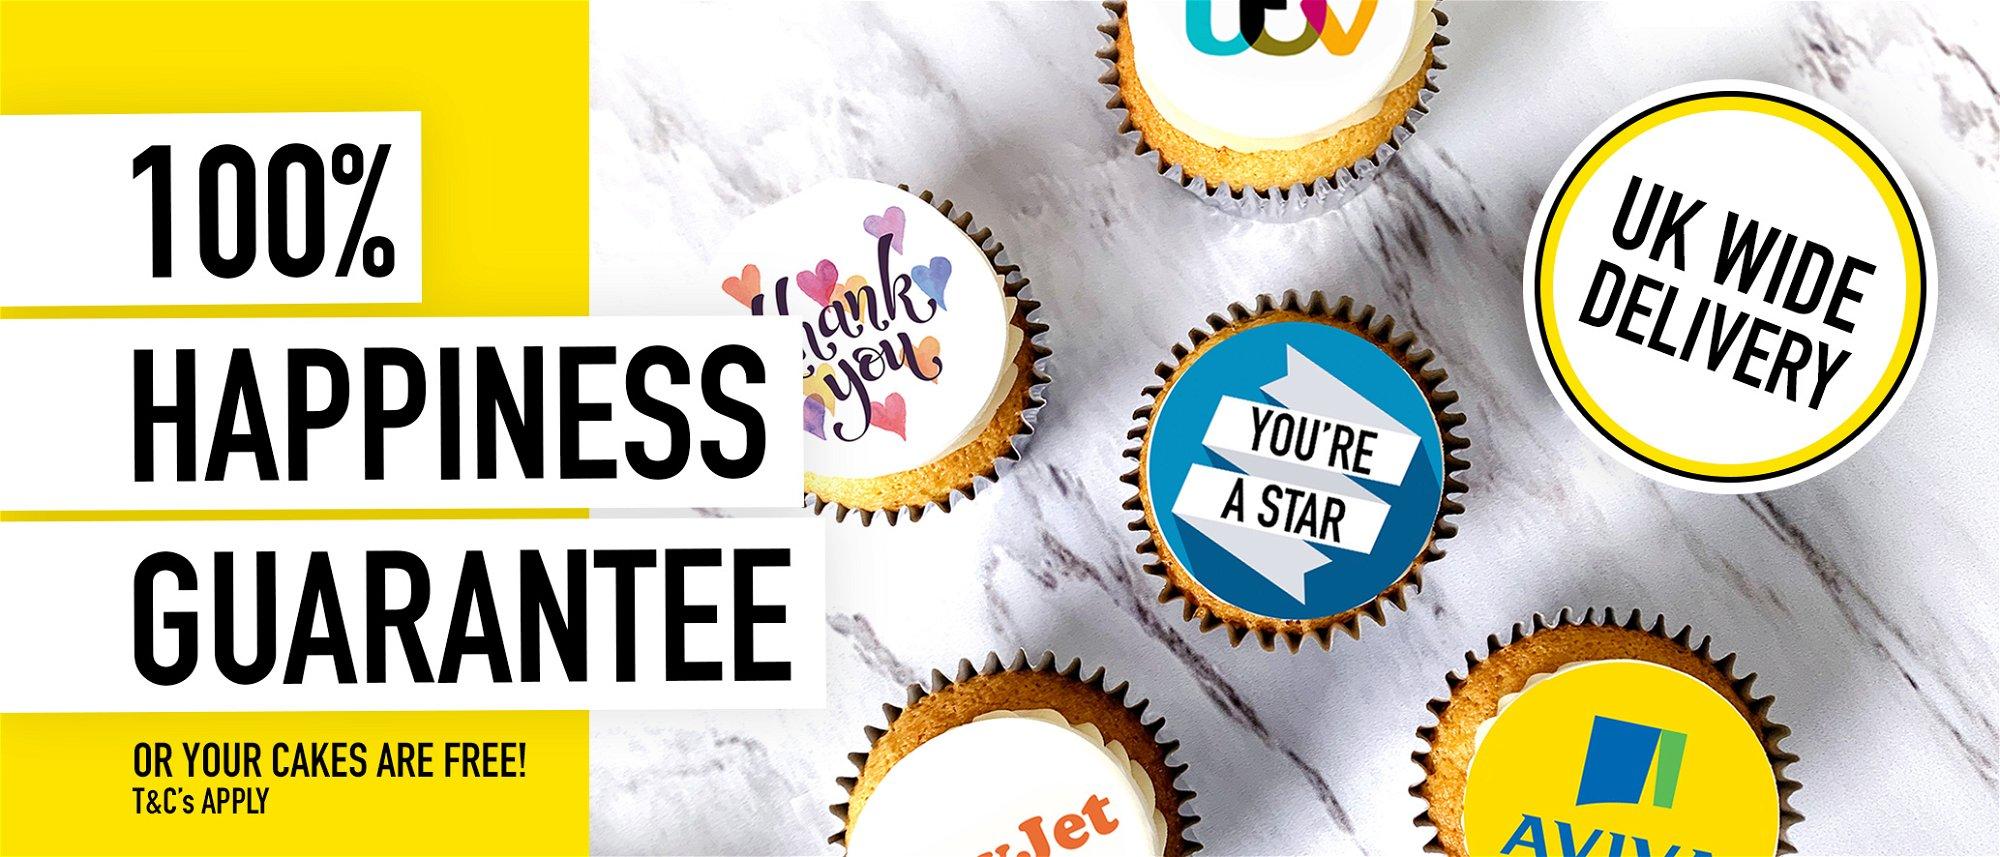 logo cupcakes delivered uk